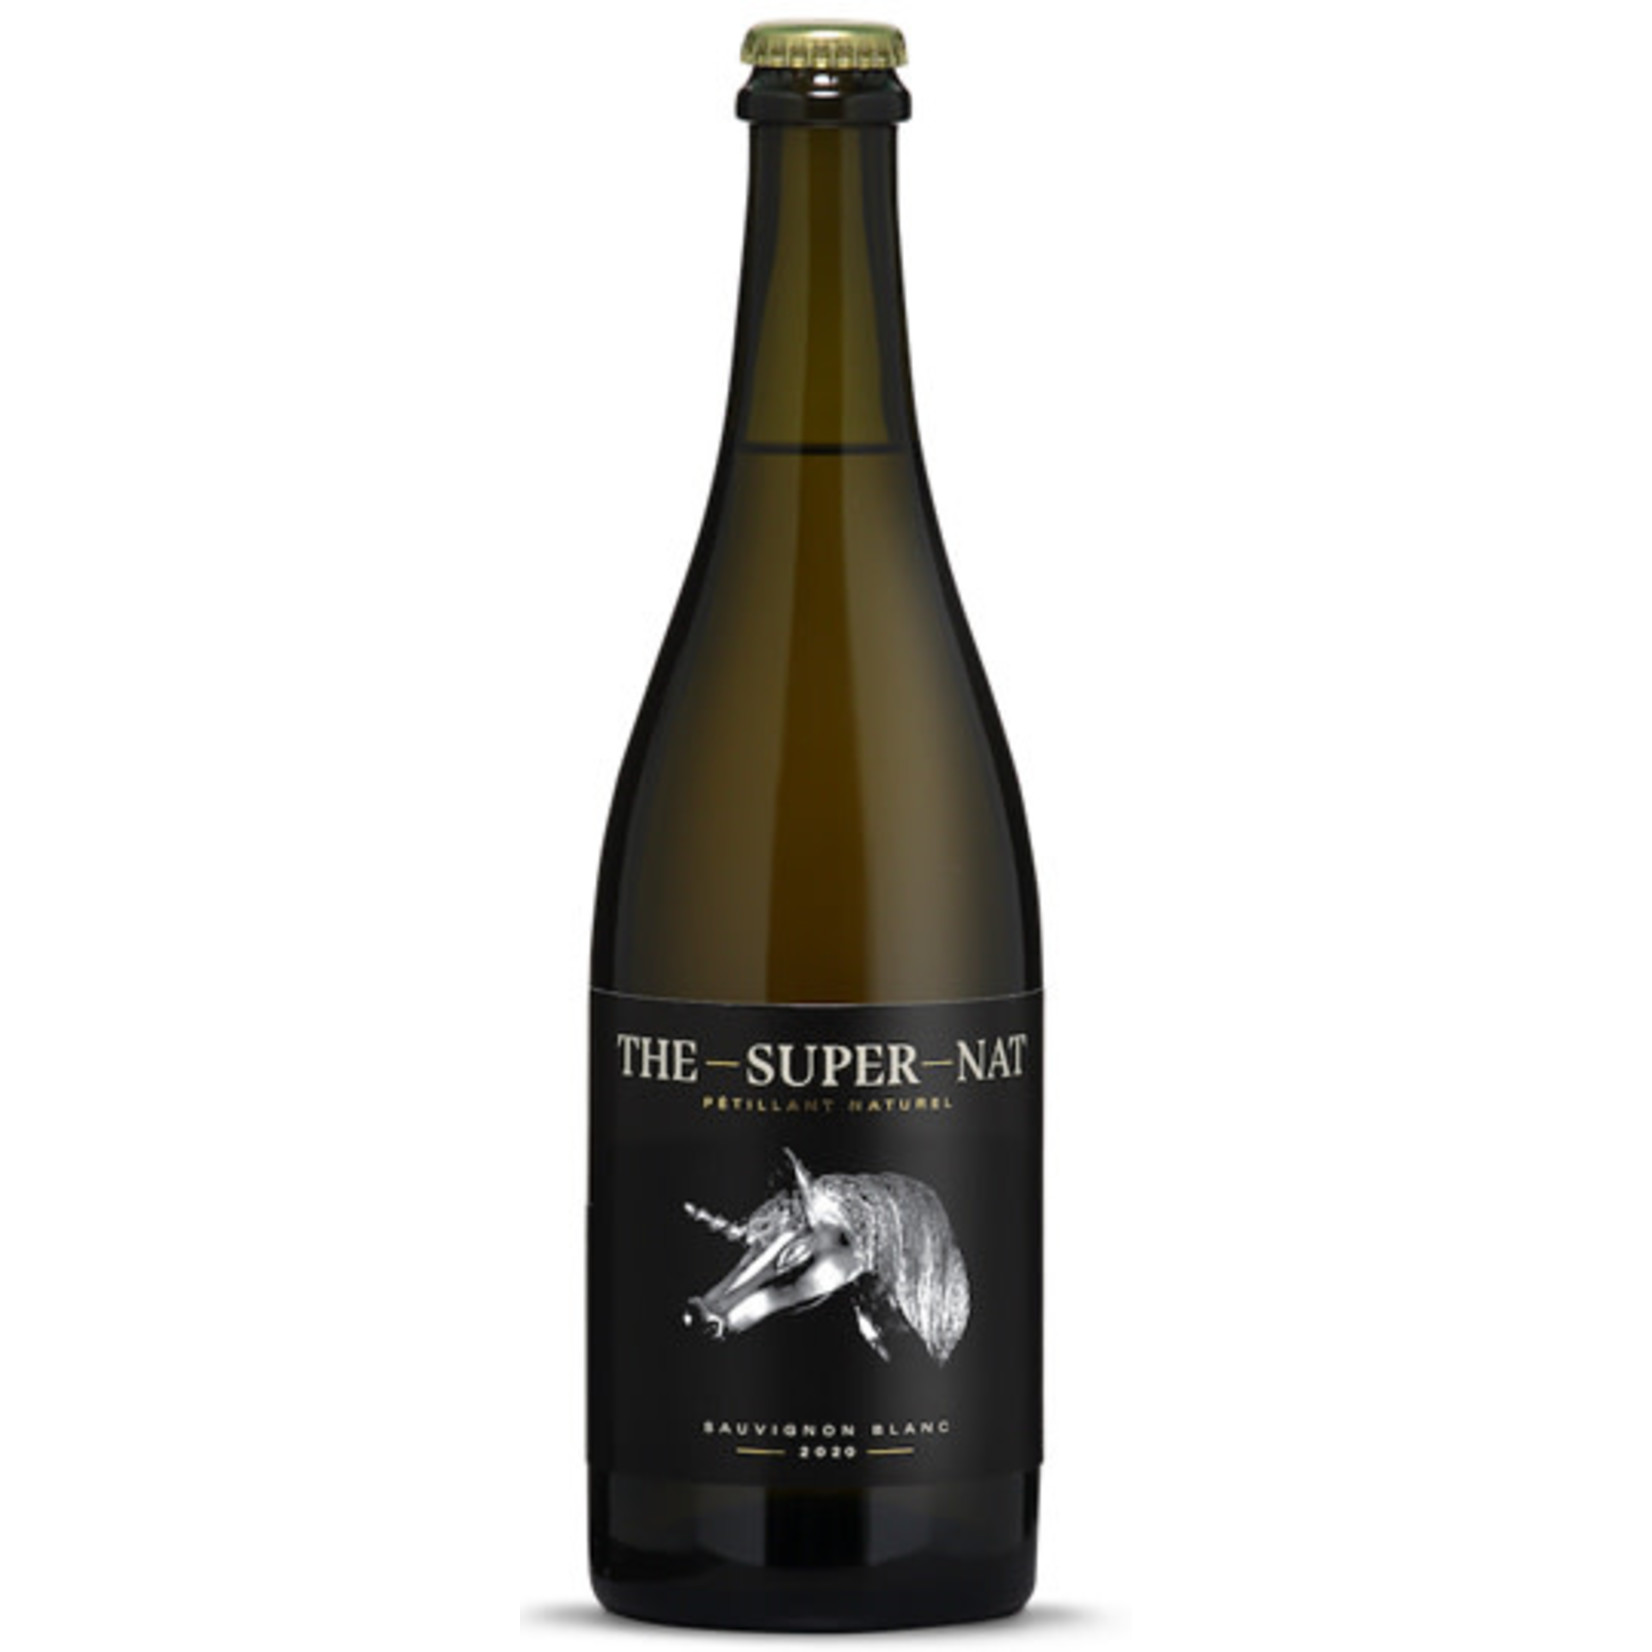 Sparkling The Super Nat Petillant Naturel Sauvignon Blanc 2020